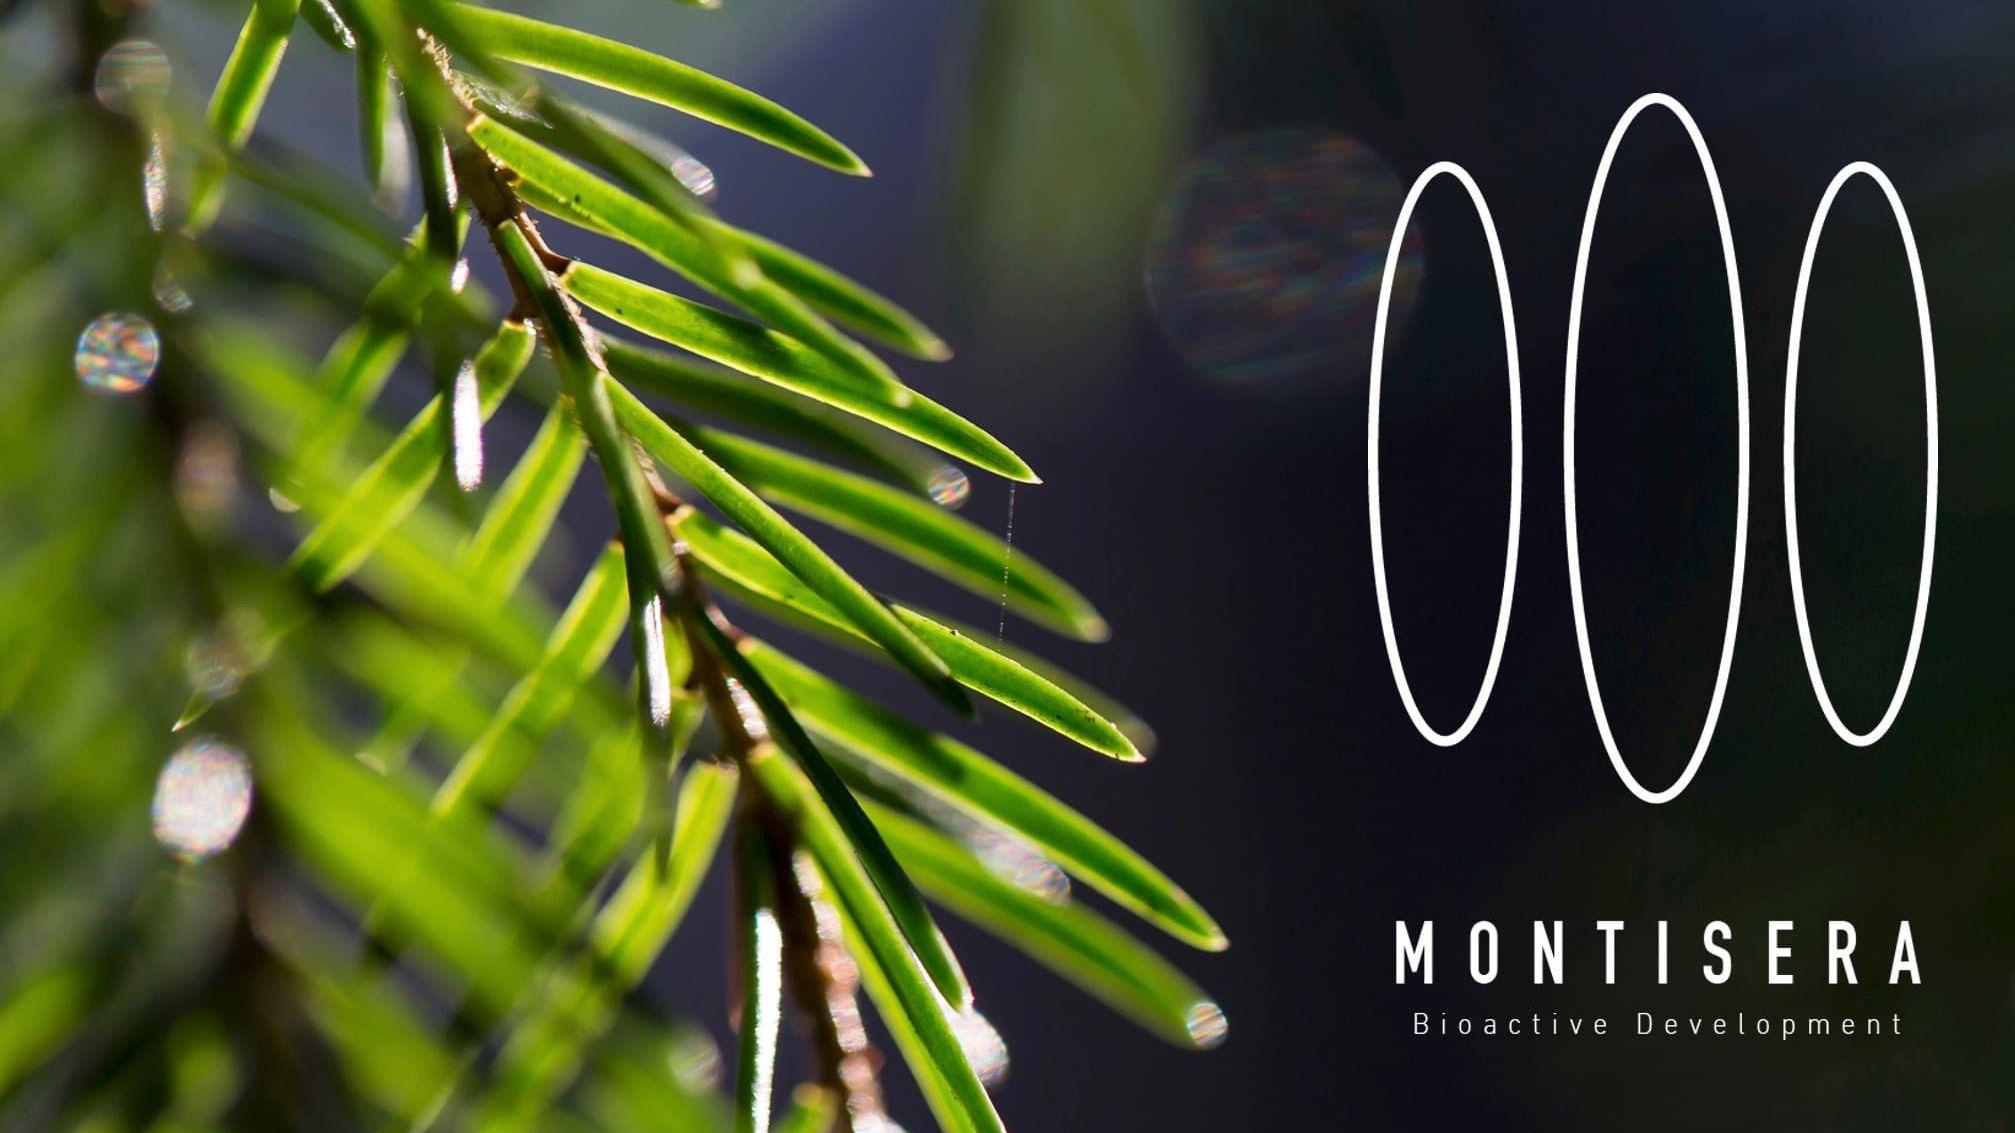 Montisera_Patents_Trademarks_16x9